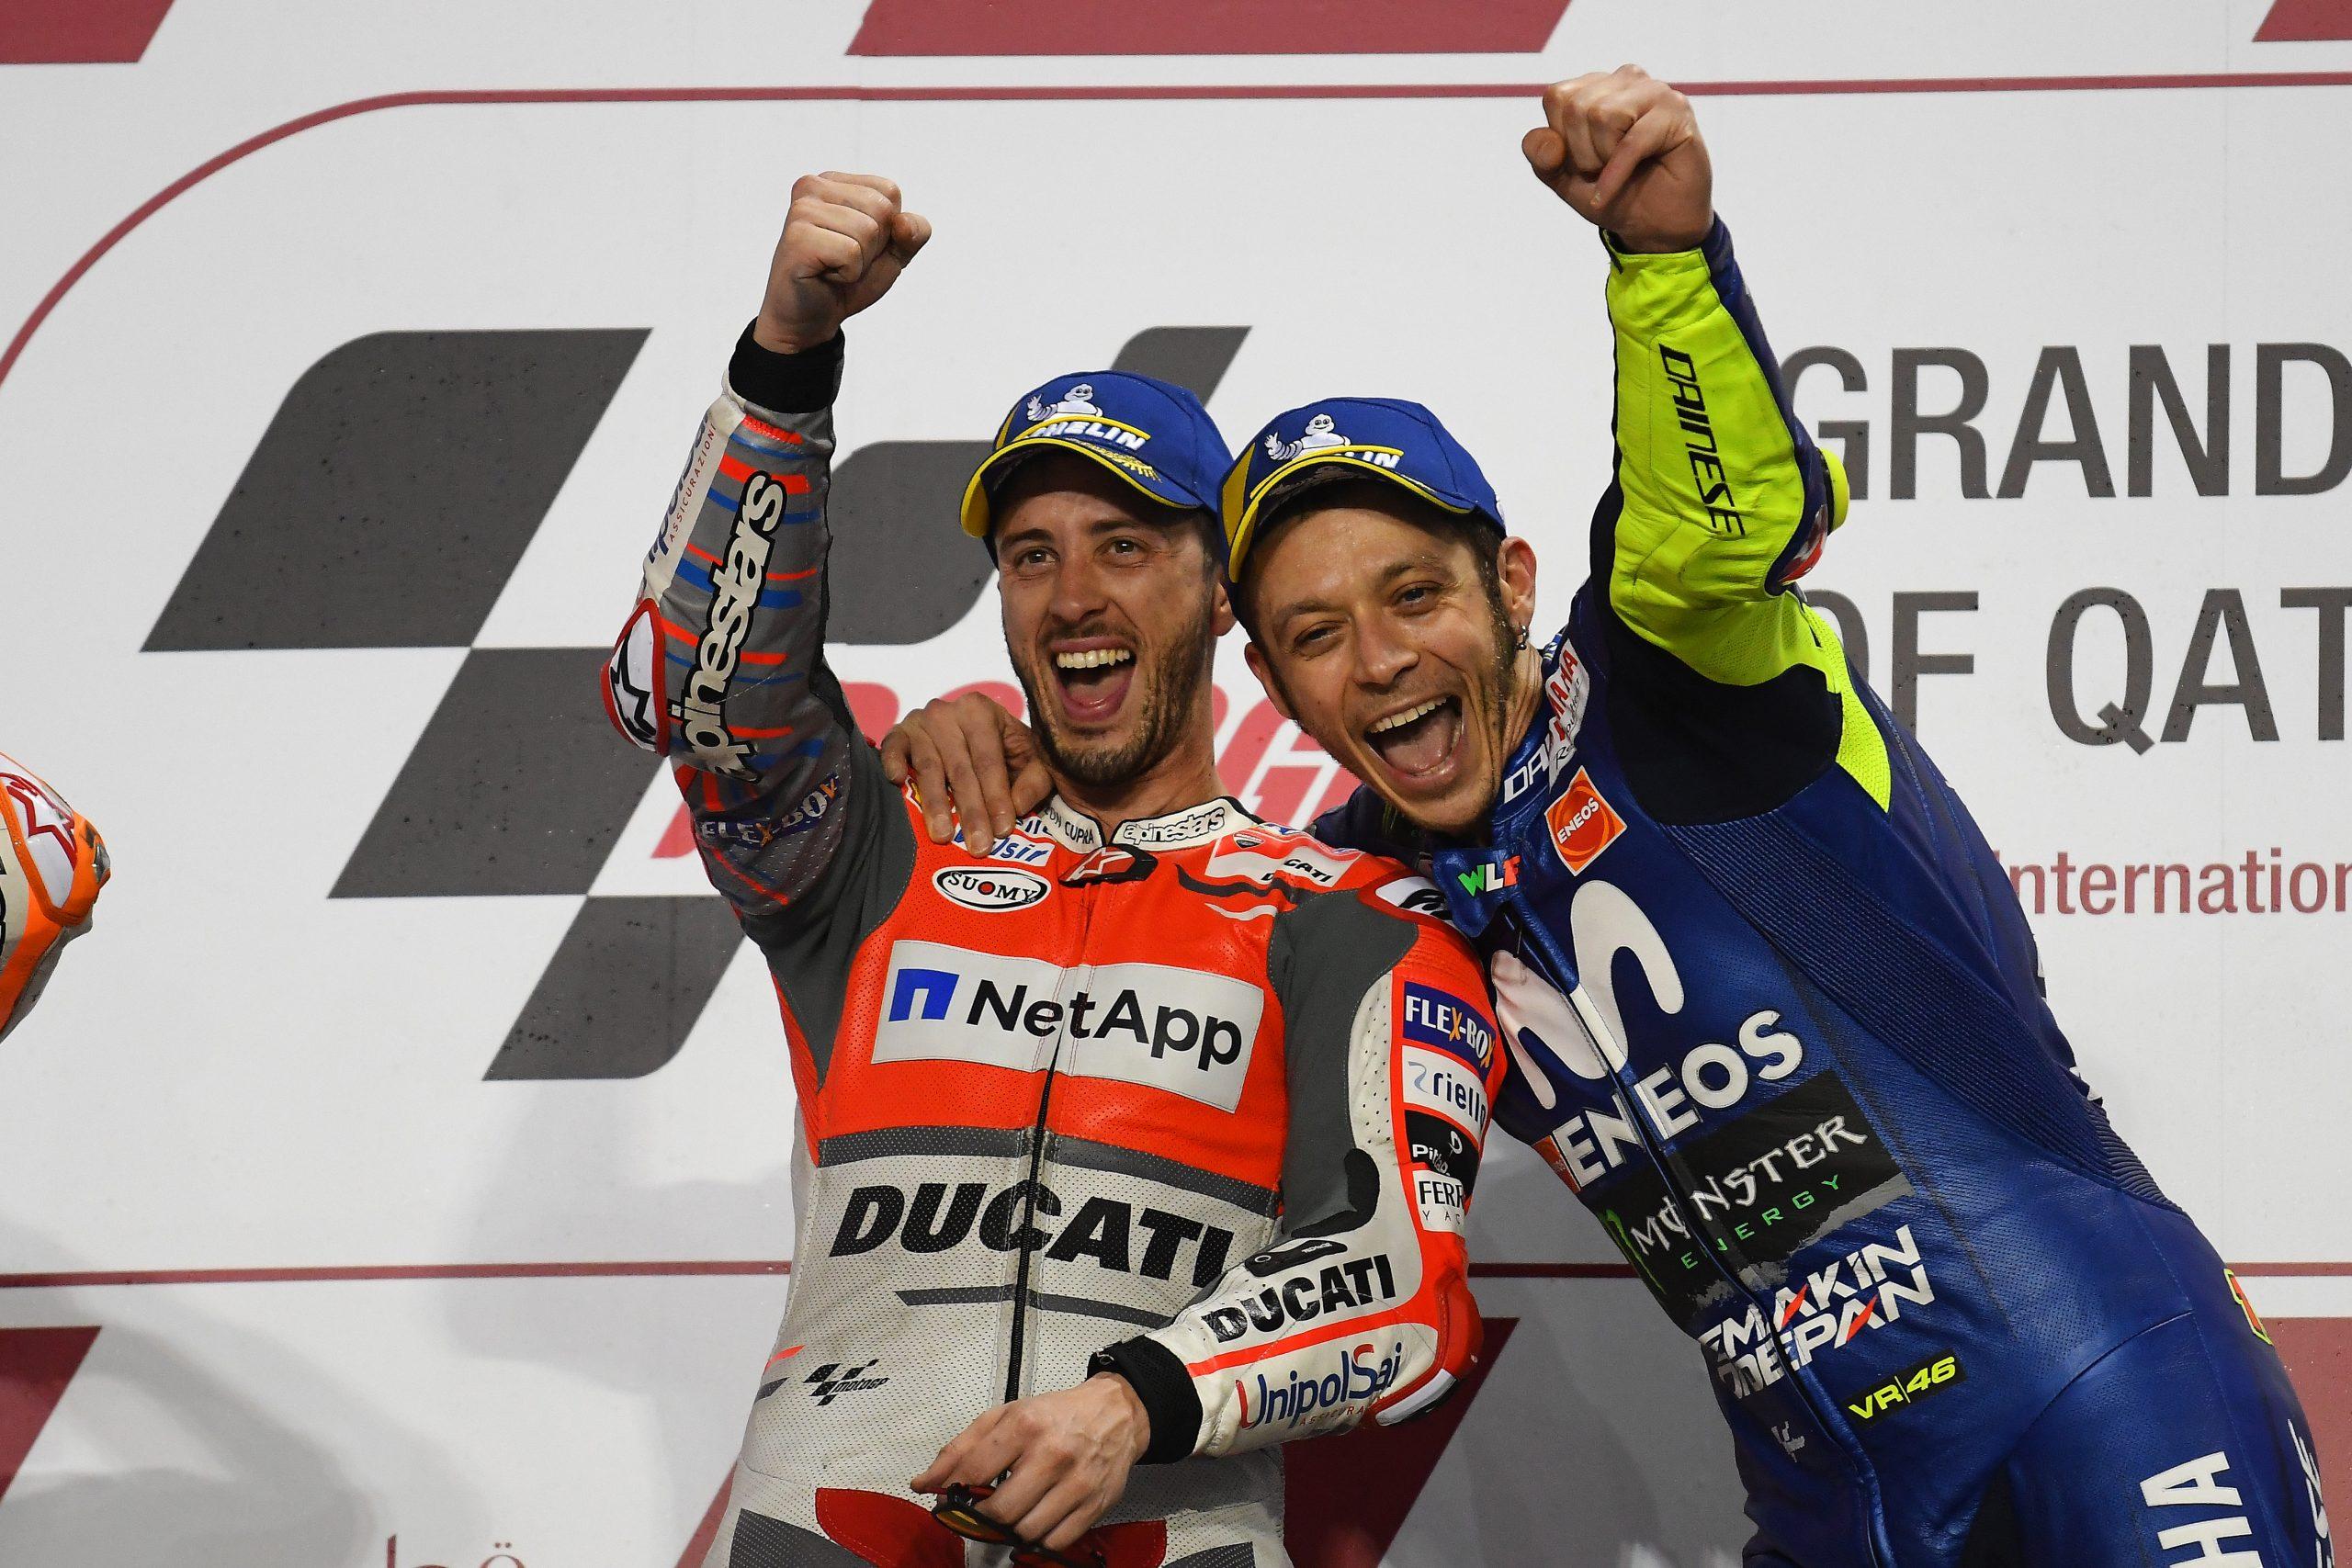 Andrea Dovizioso i Valentino Rossi razem na podium w Katarze